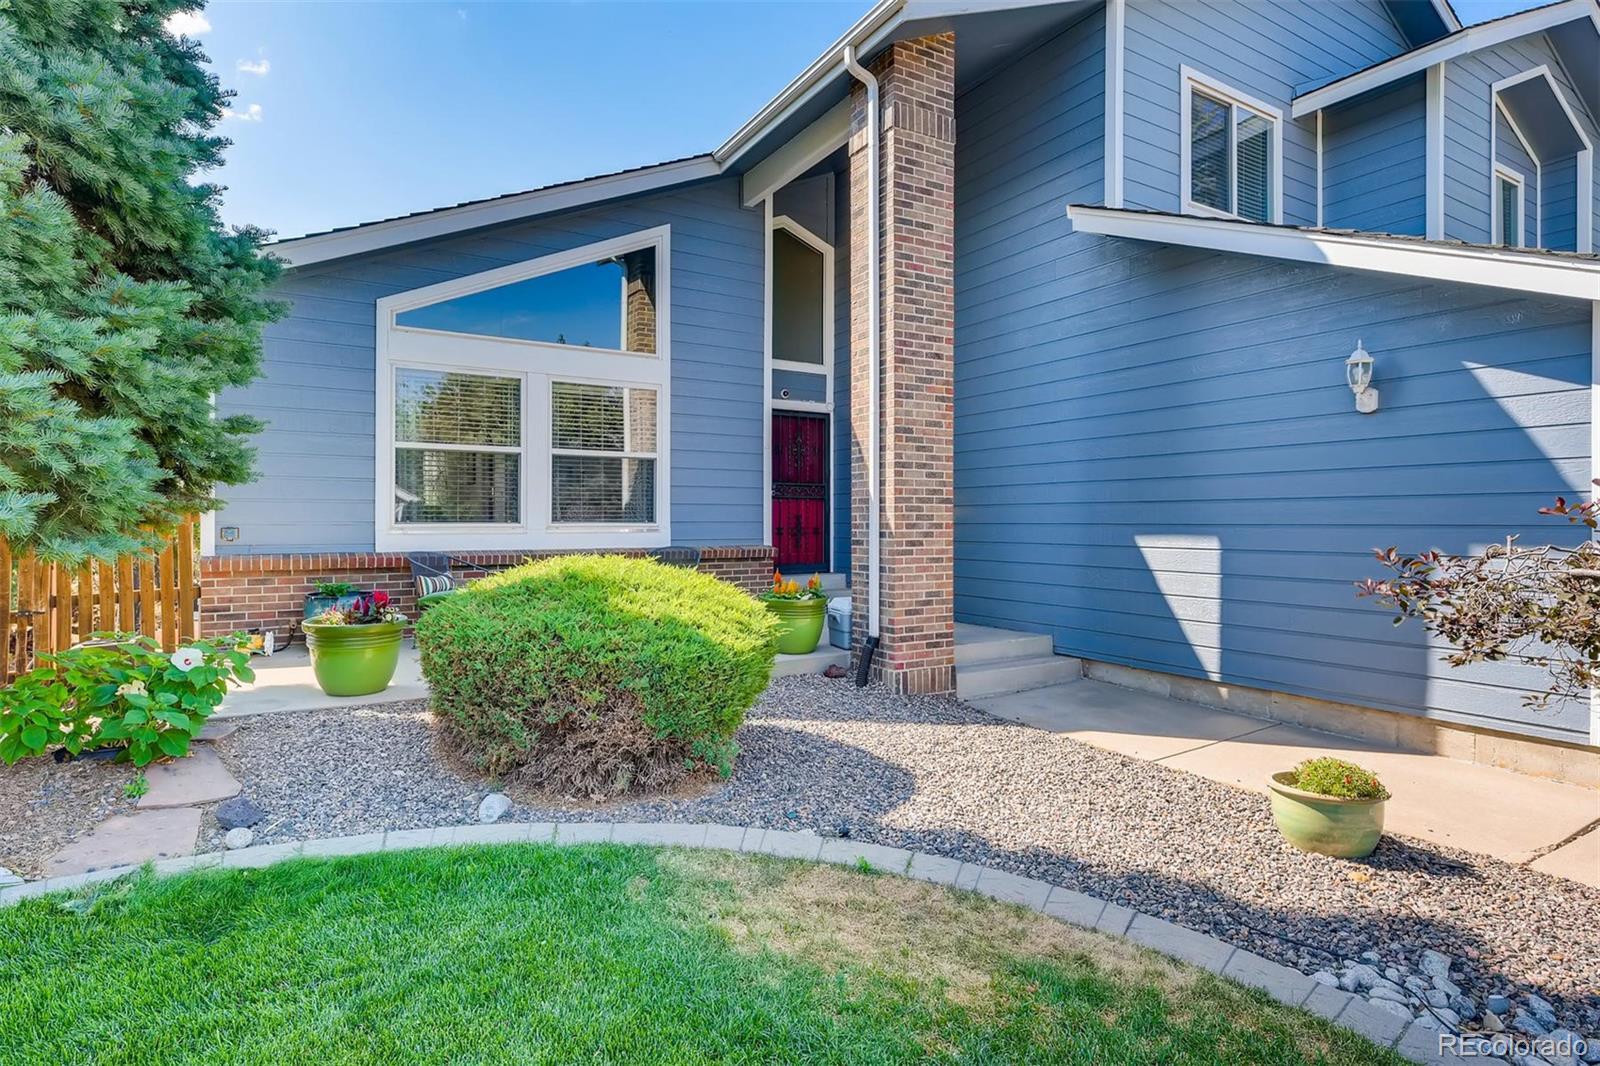 MLS# 2832026 - 2 - 1594 Arrowhead Road, Highlands Ranch, CO 80126